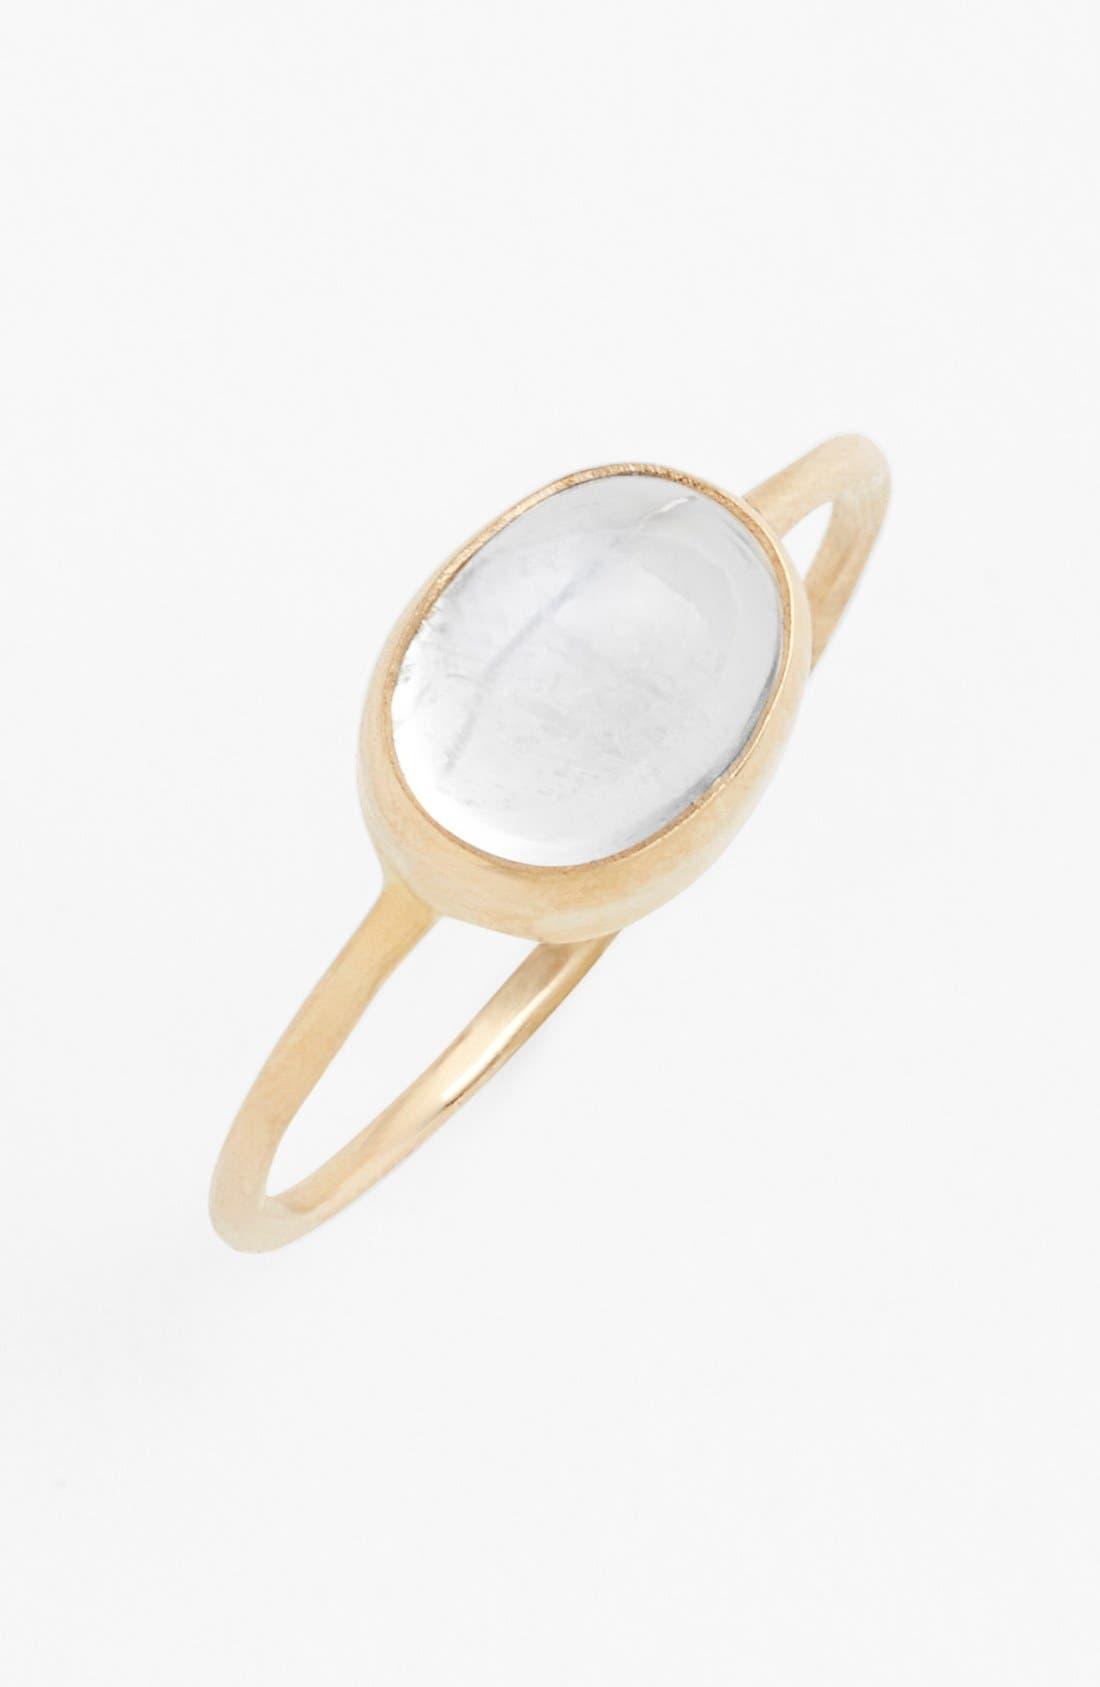 Main Image - Melissa Joy Manning Oval Semiprecious Stone Ring